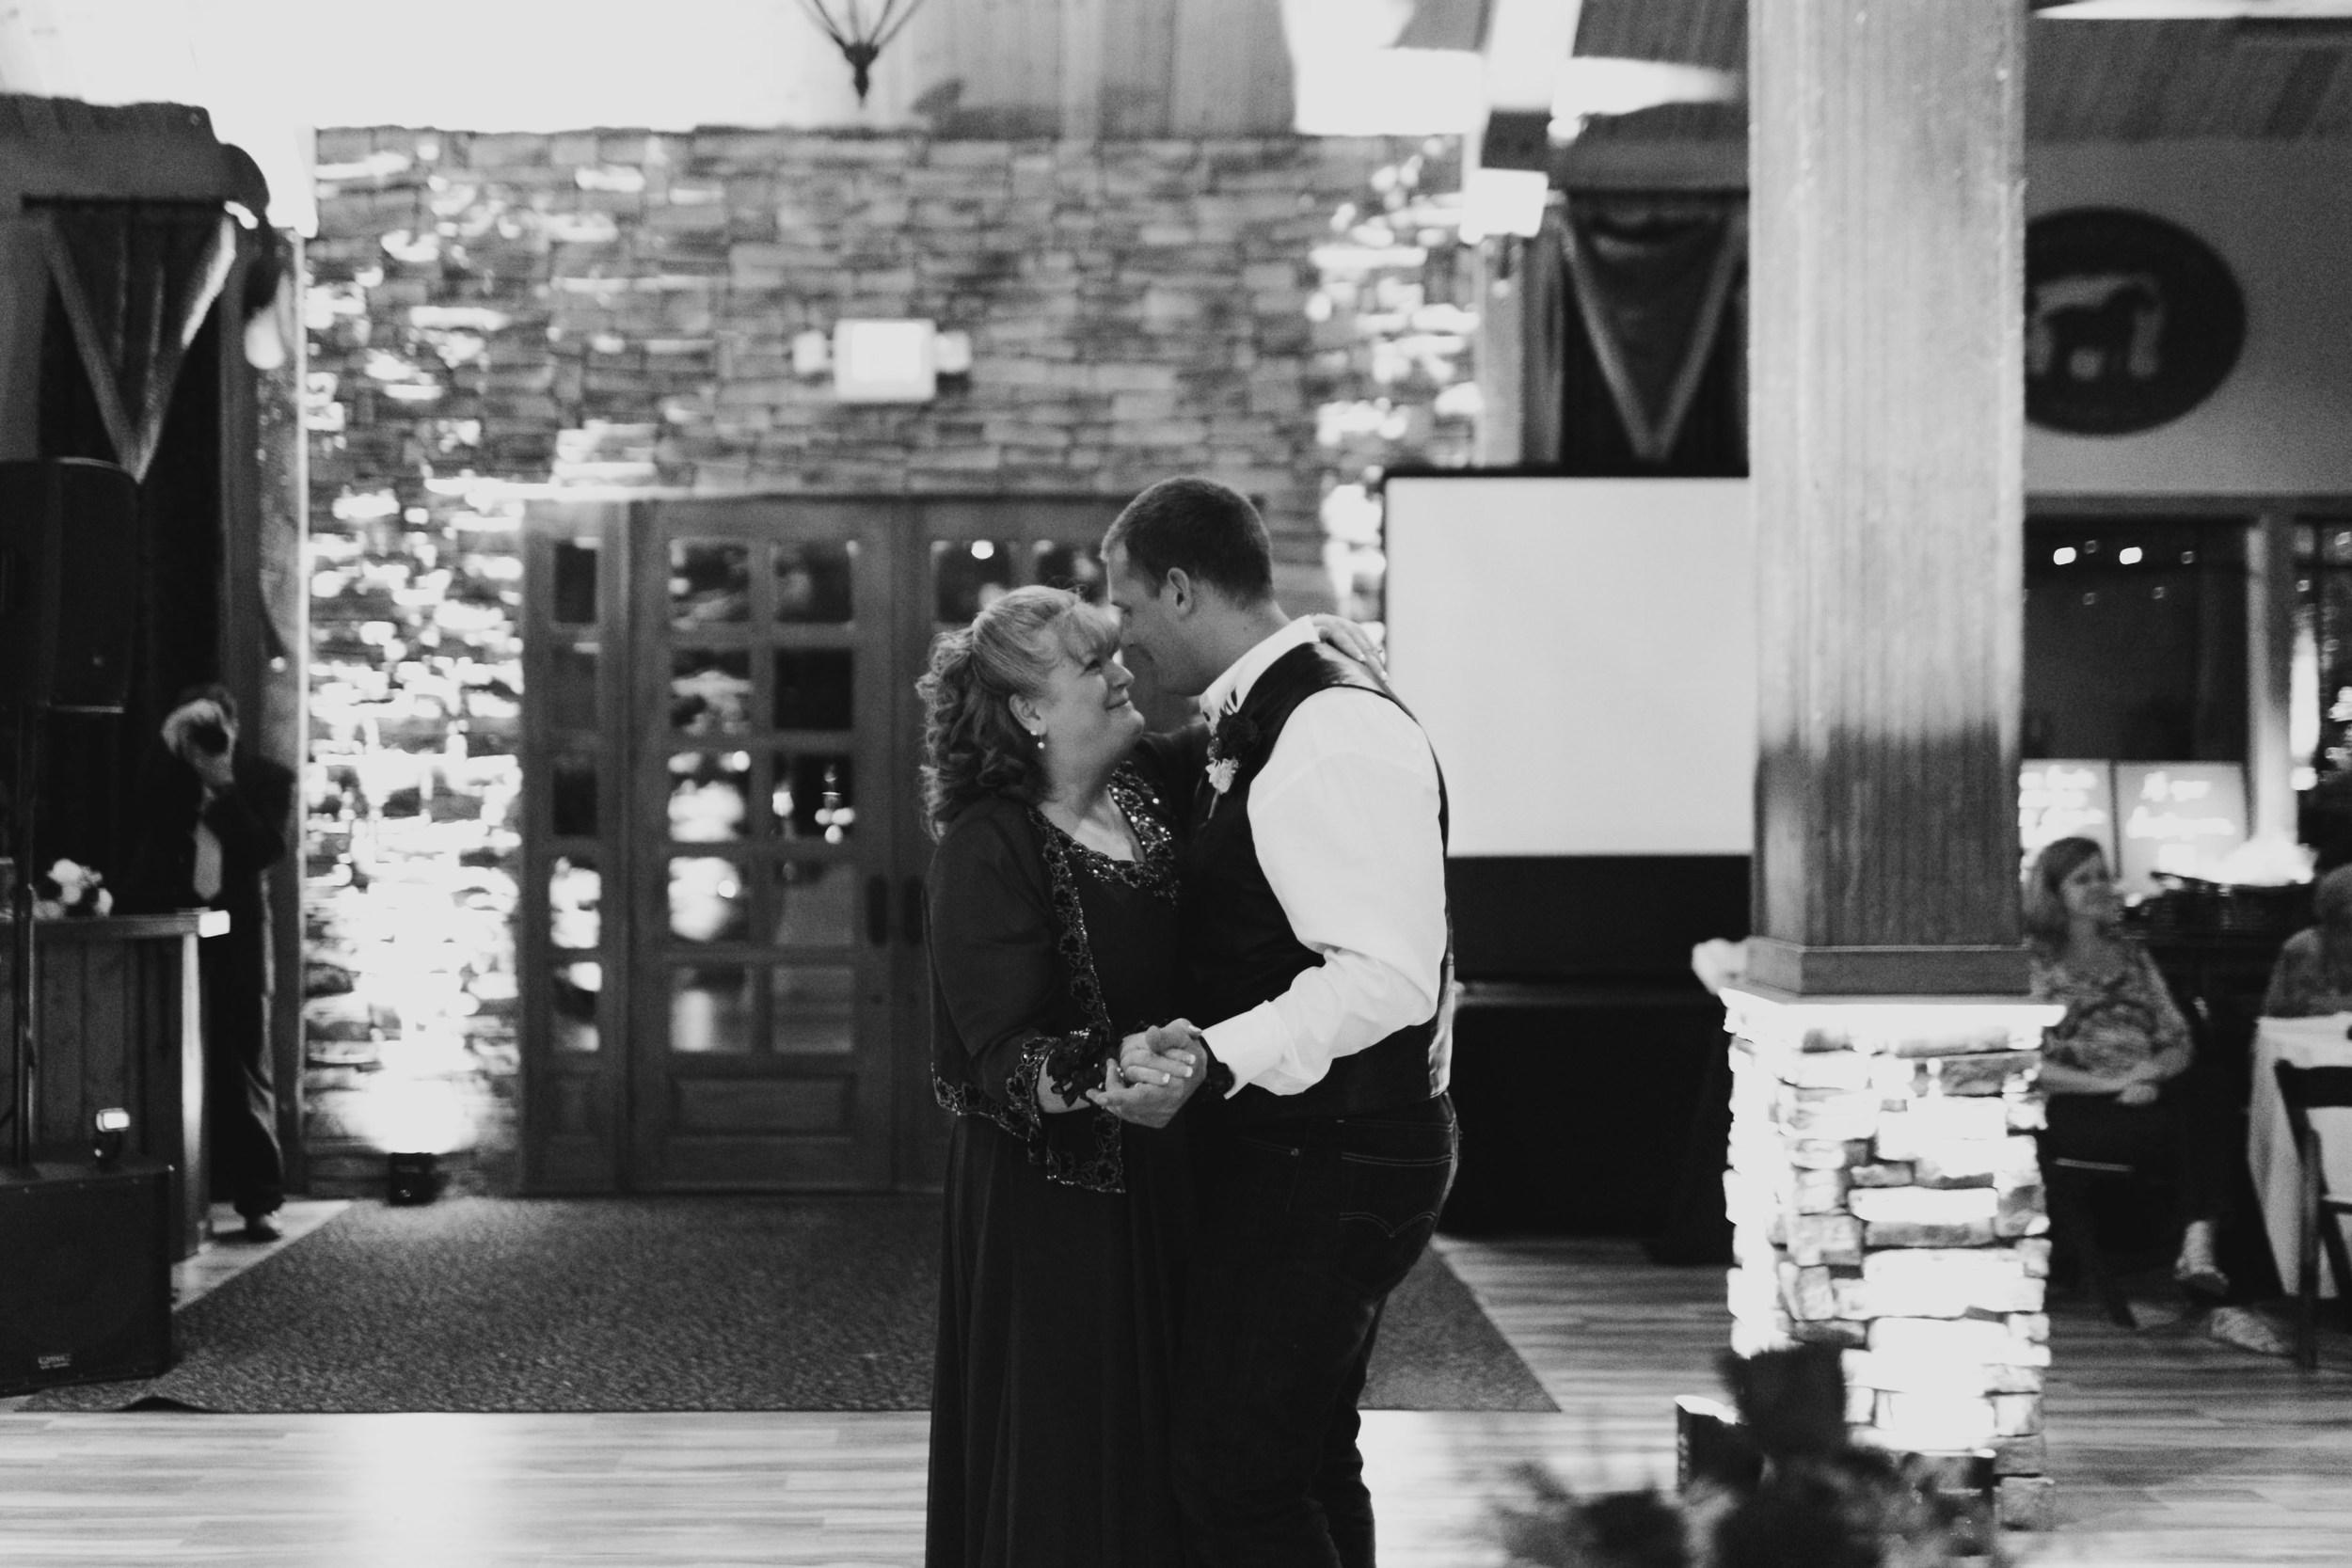 Cheyenne + Jordan - Wedding, Natalie Griffo (121 of 157).jpg